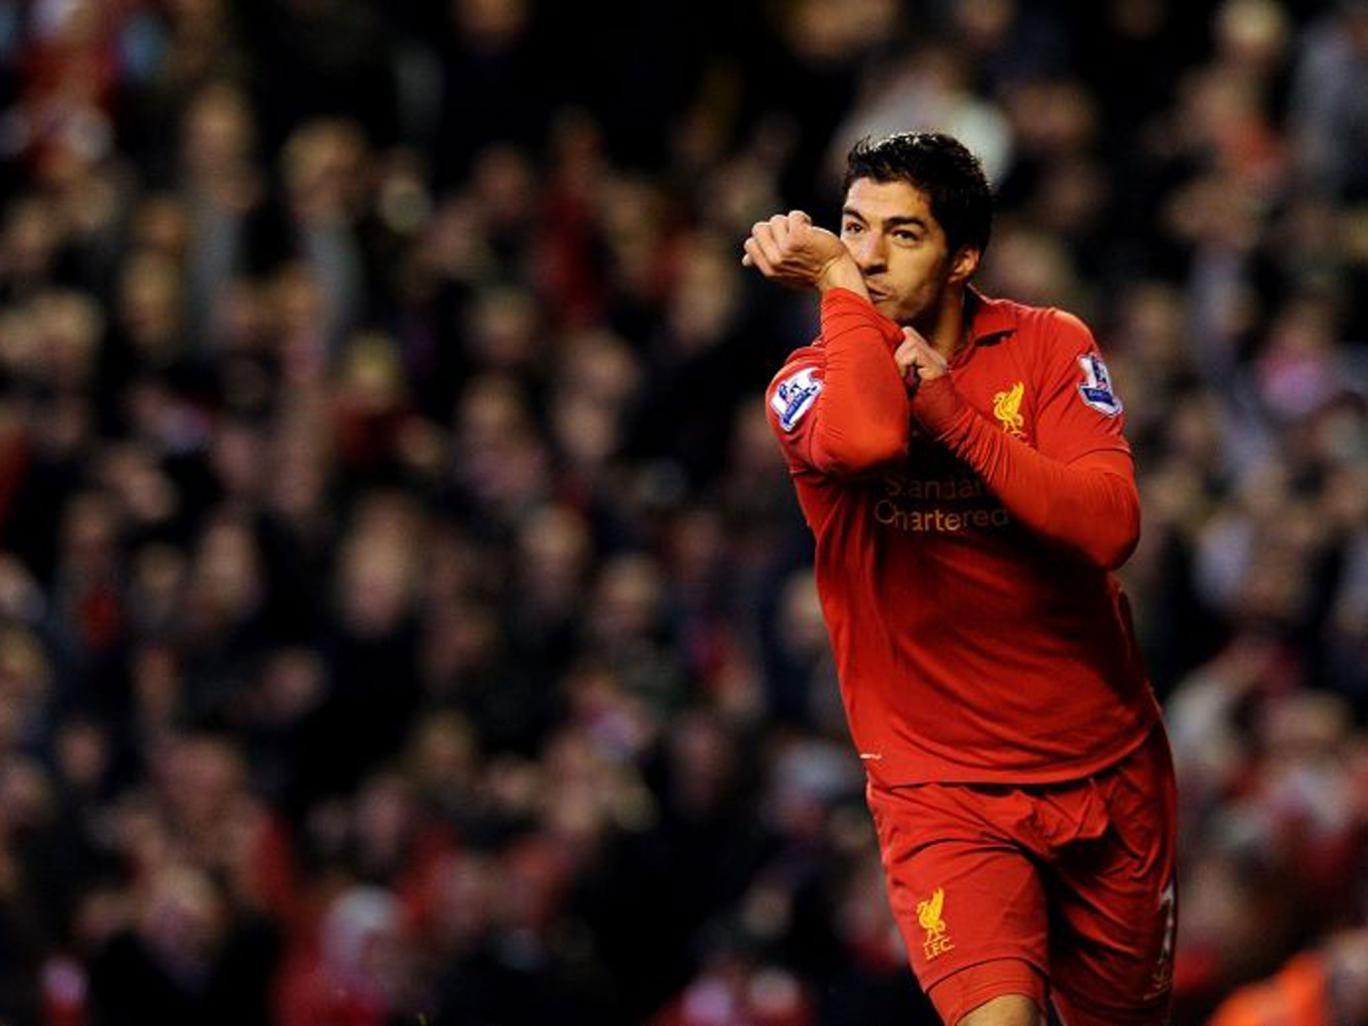 Tomorrow's encounter really does feel like a symmetrical Robin van Persie versus Luis Suarez shoot-out